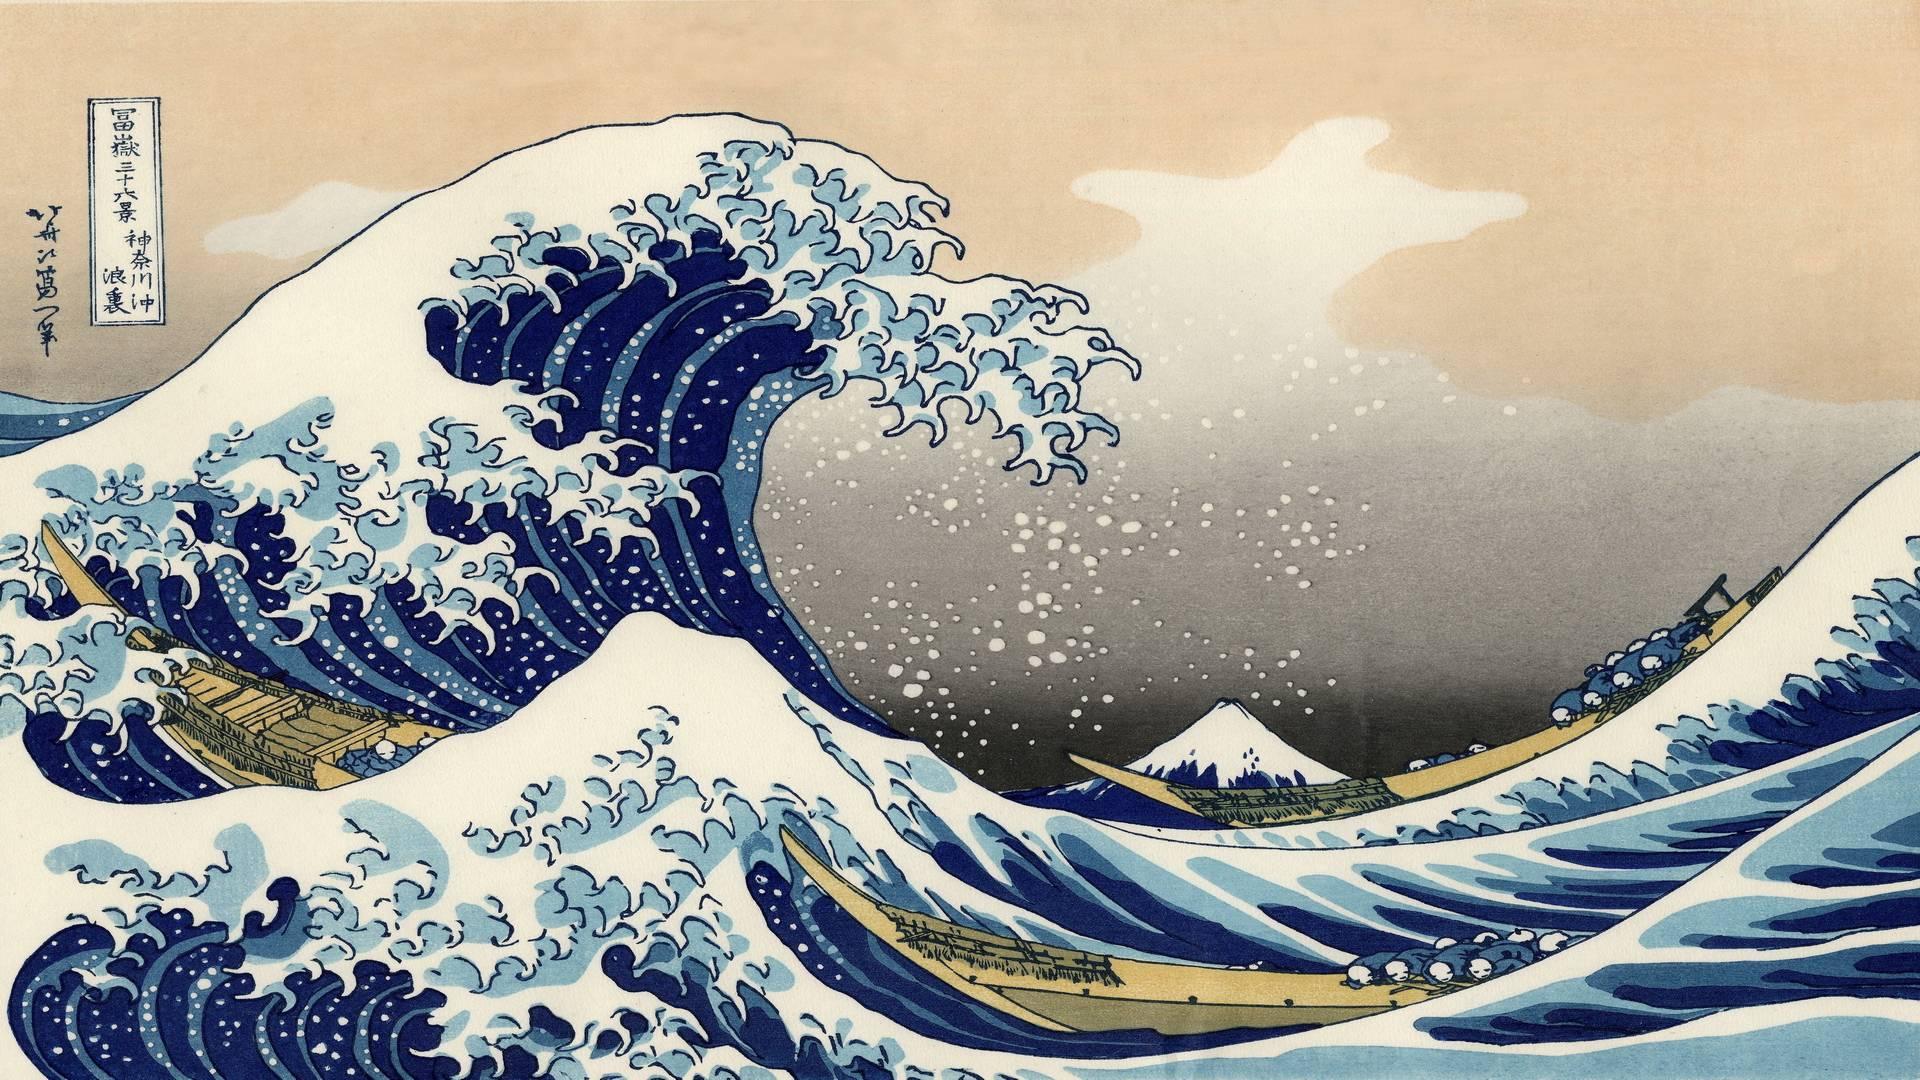 Tsunami Wallpapers - Wallpaper Cave